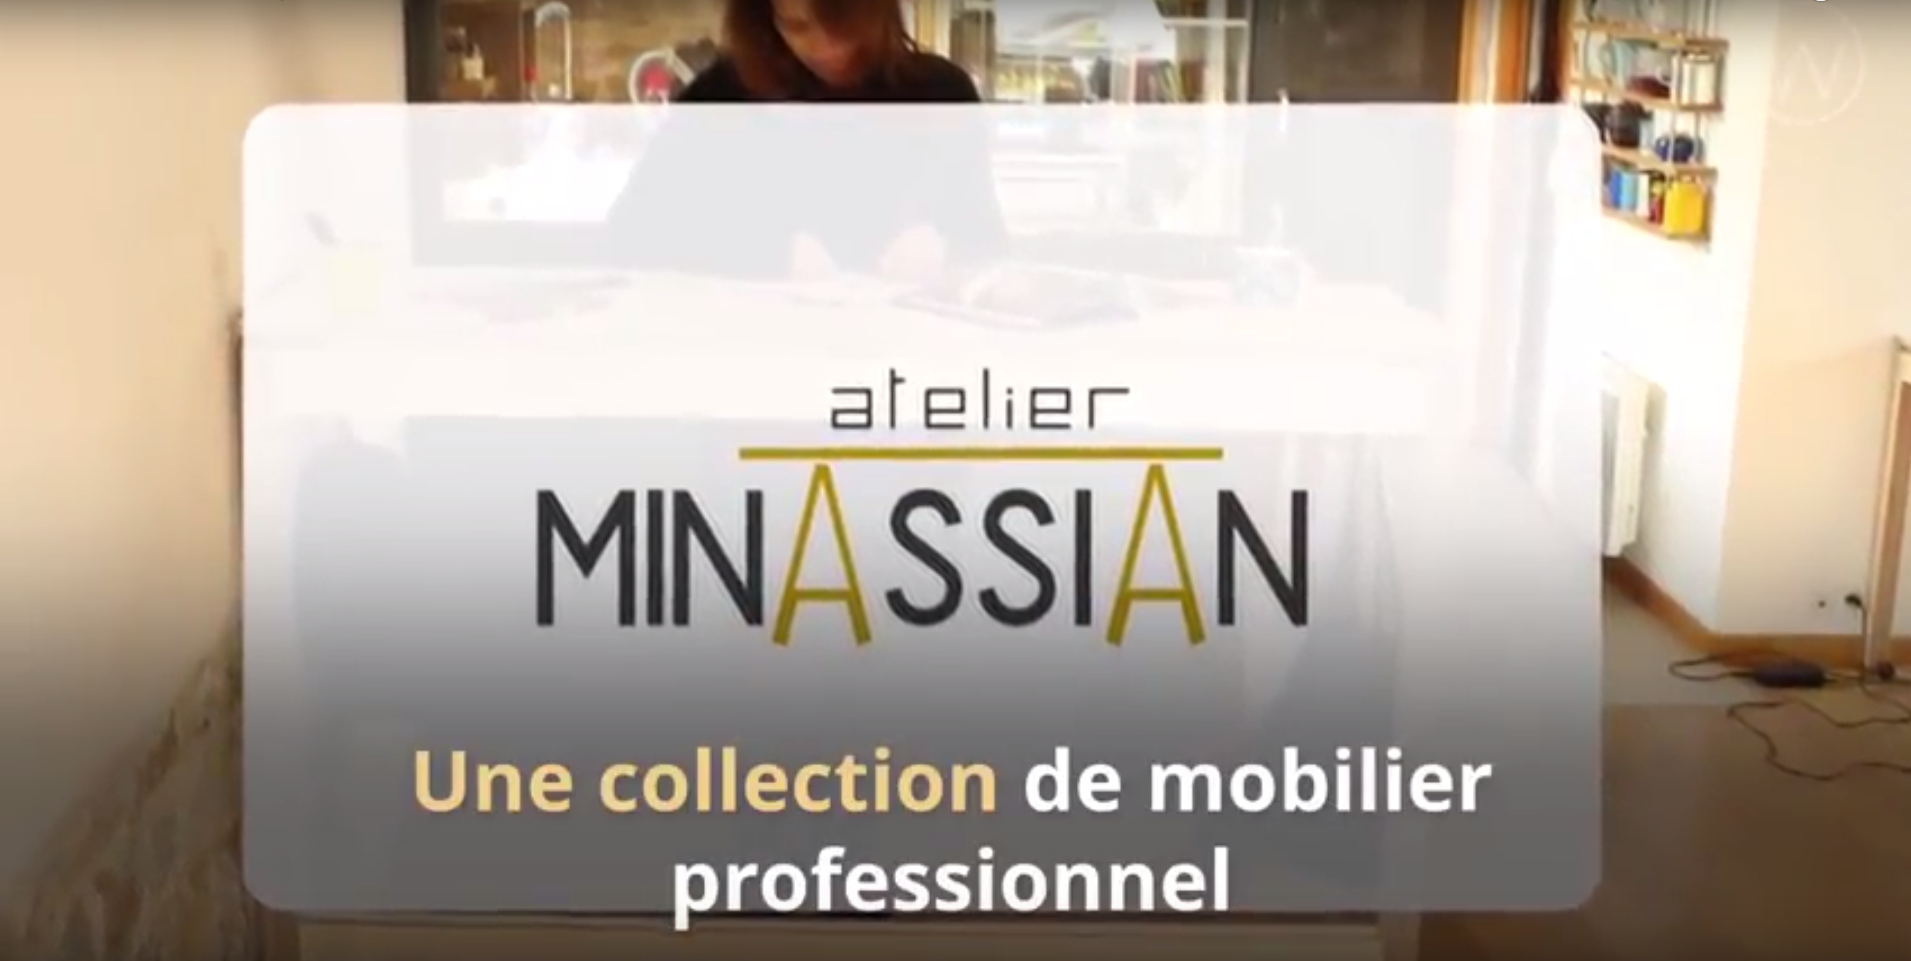 Meubles de bureau de l'Atelier Minassian